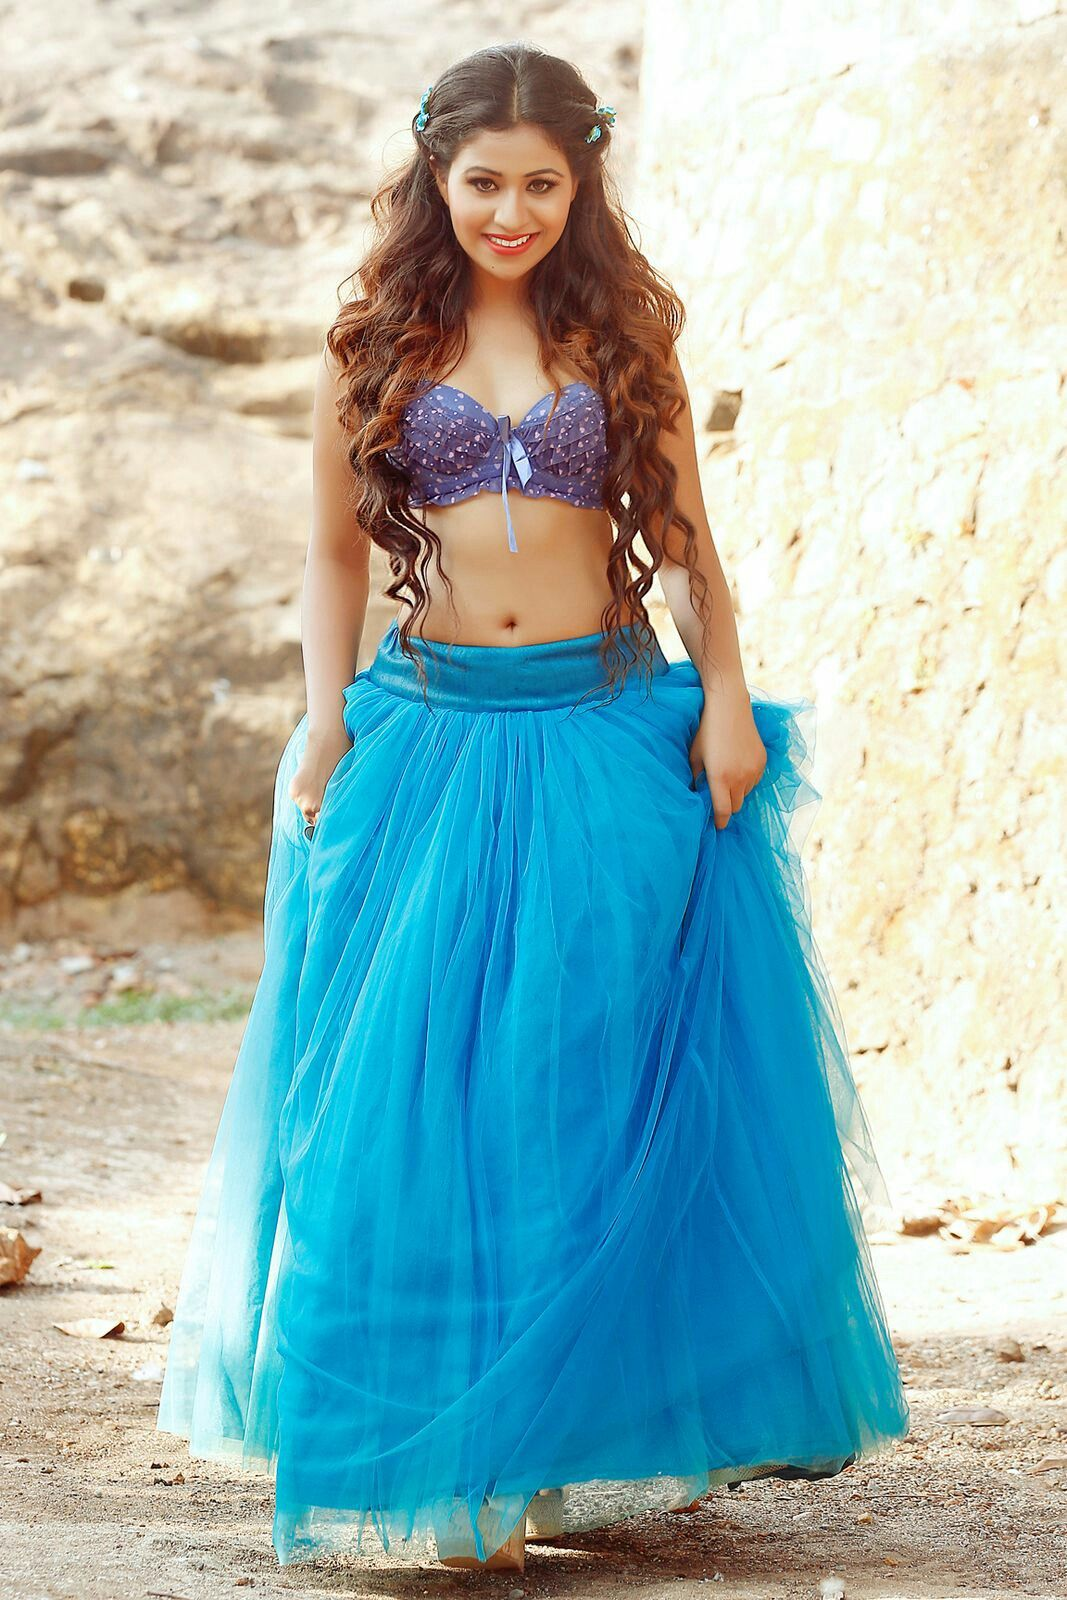 Manali rathod | Navel show | Pinterest | Navel, Exotic beauties and ...